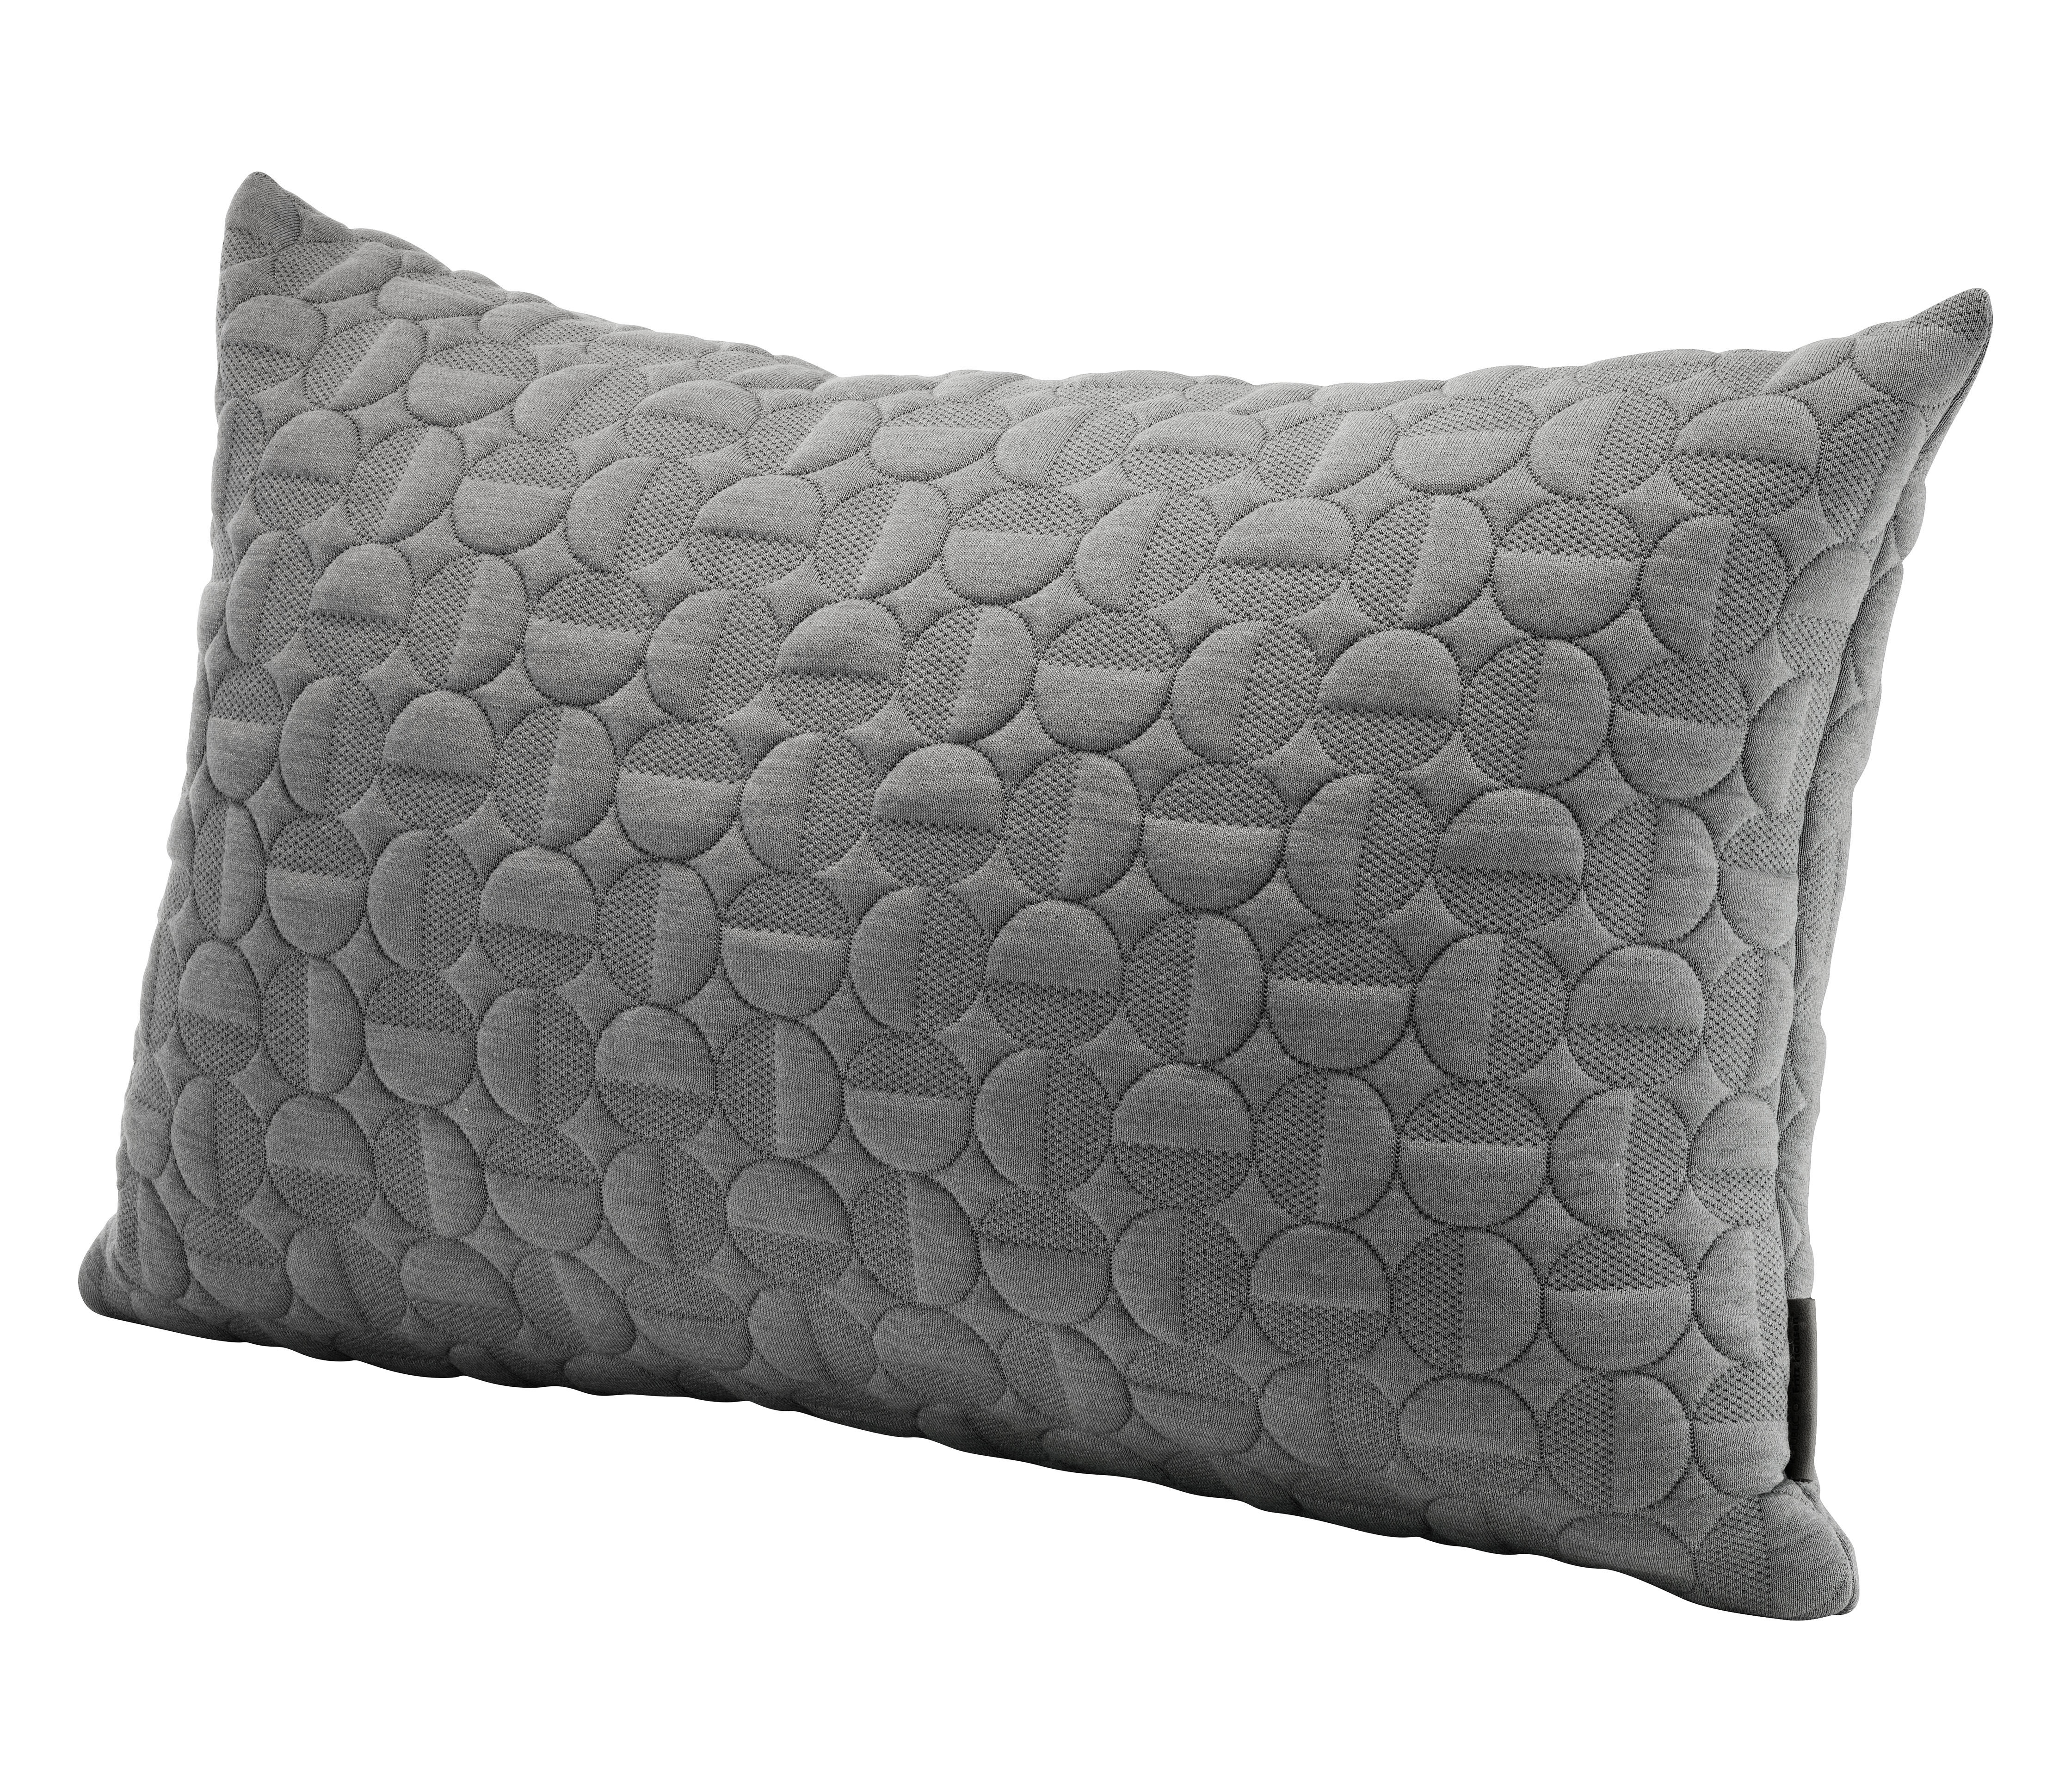 Decoration - Cushions & Poufs - Vertigo Cushion - By Arne Jacobsen - 60 x 40 cm by Fritz Hansen - Light grey - Polyurethane, Wool